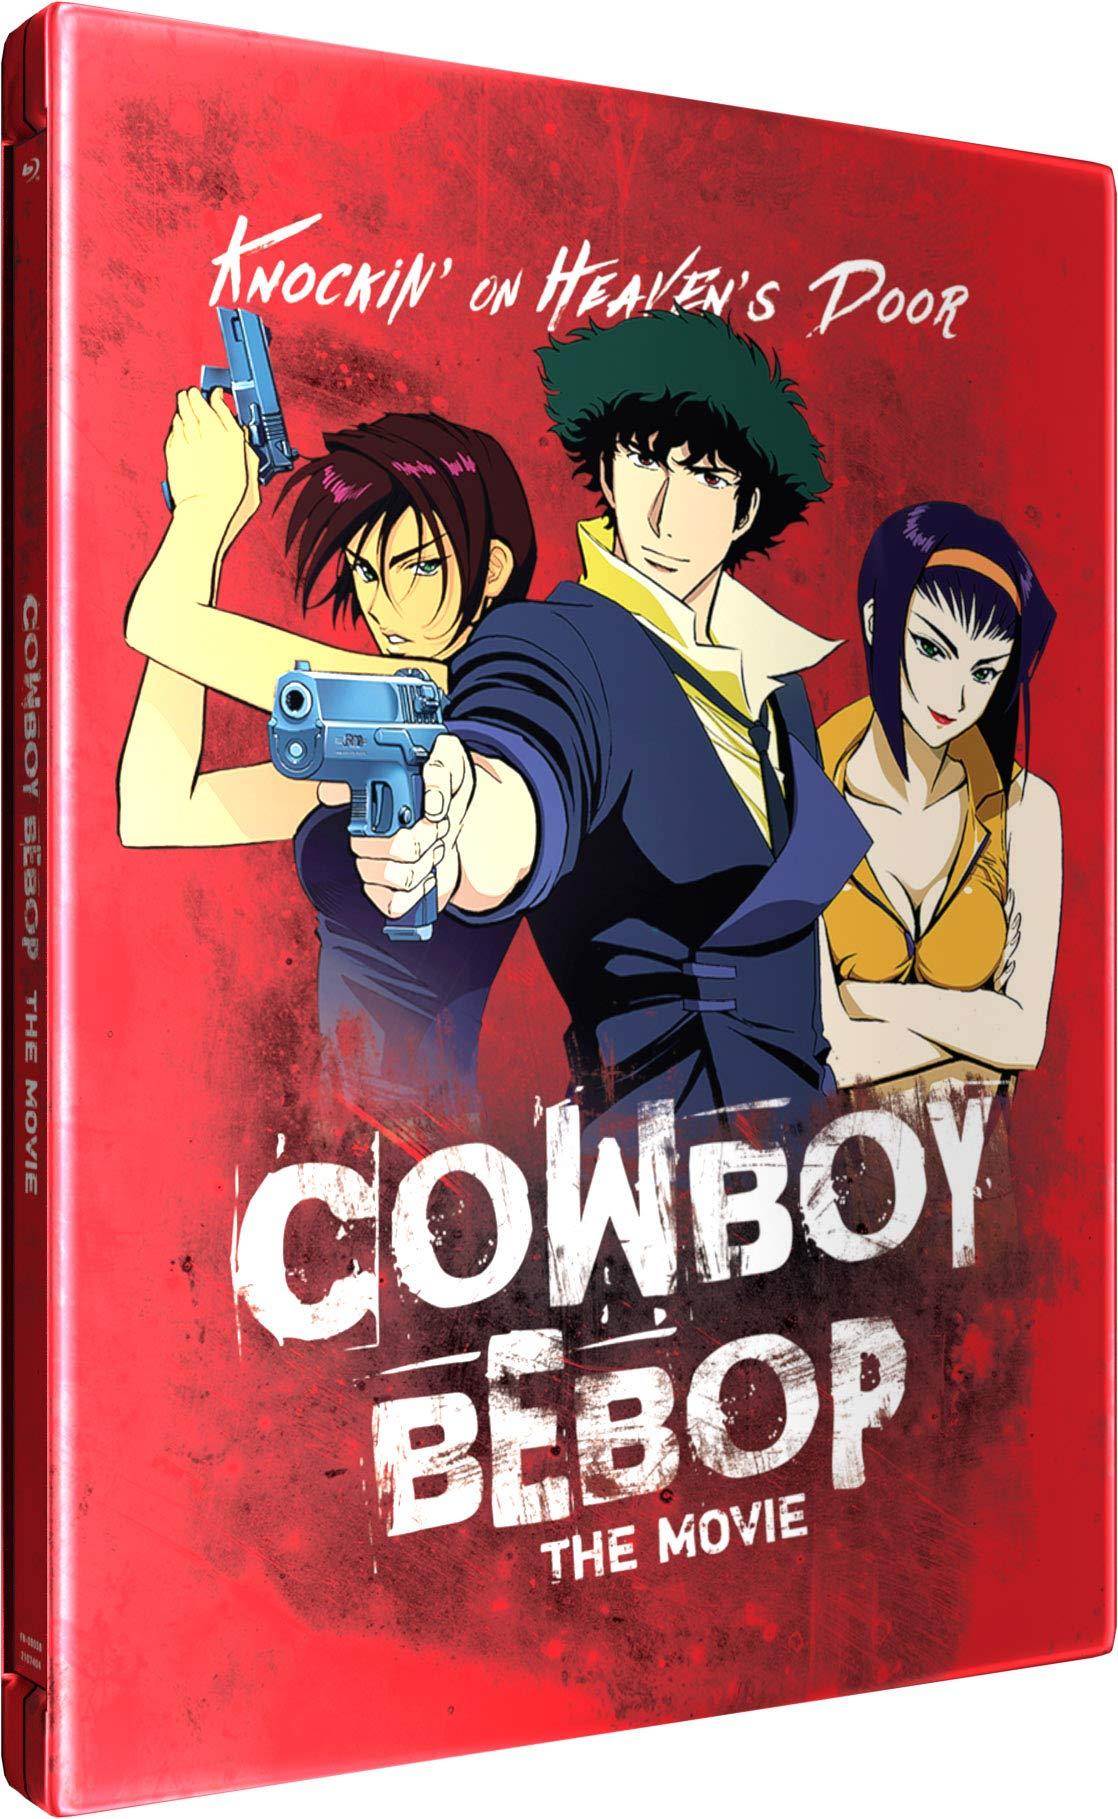 Blu-ray : Cowboy Bebop: The Movie - Knockin' On Heaven's Door (Limited Edition, Steelbook, Subtitled)